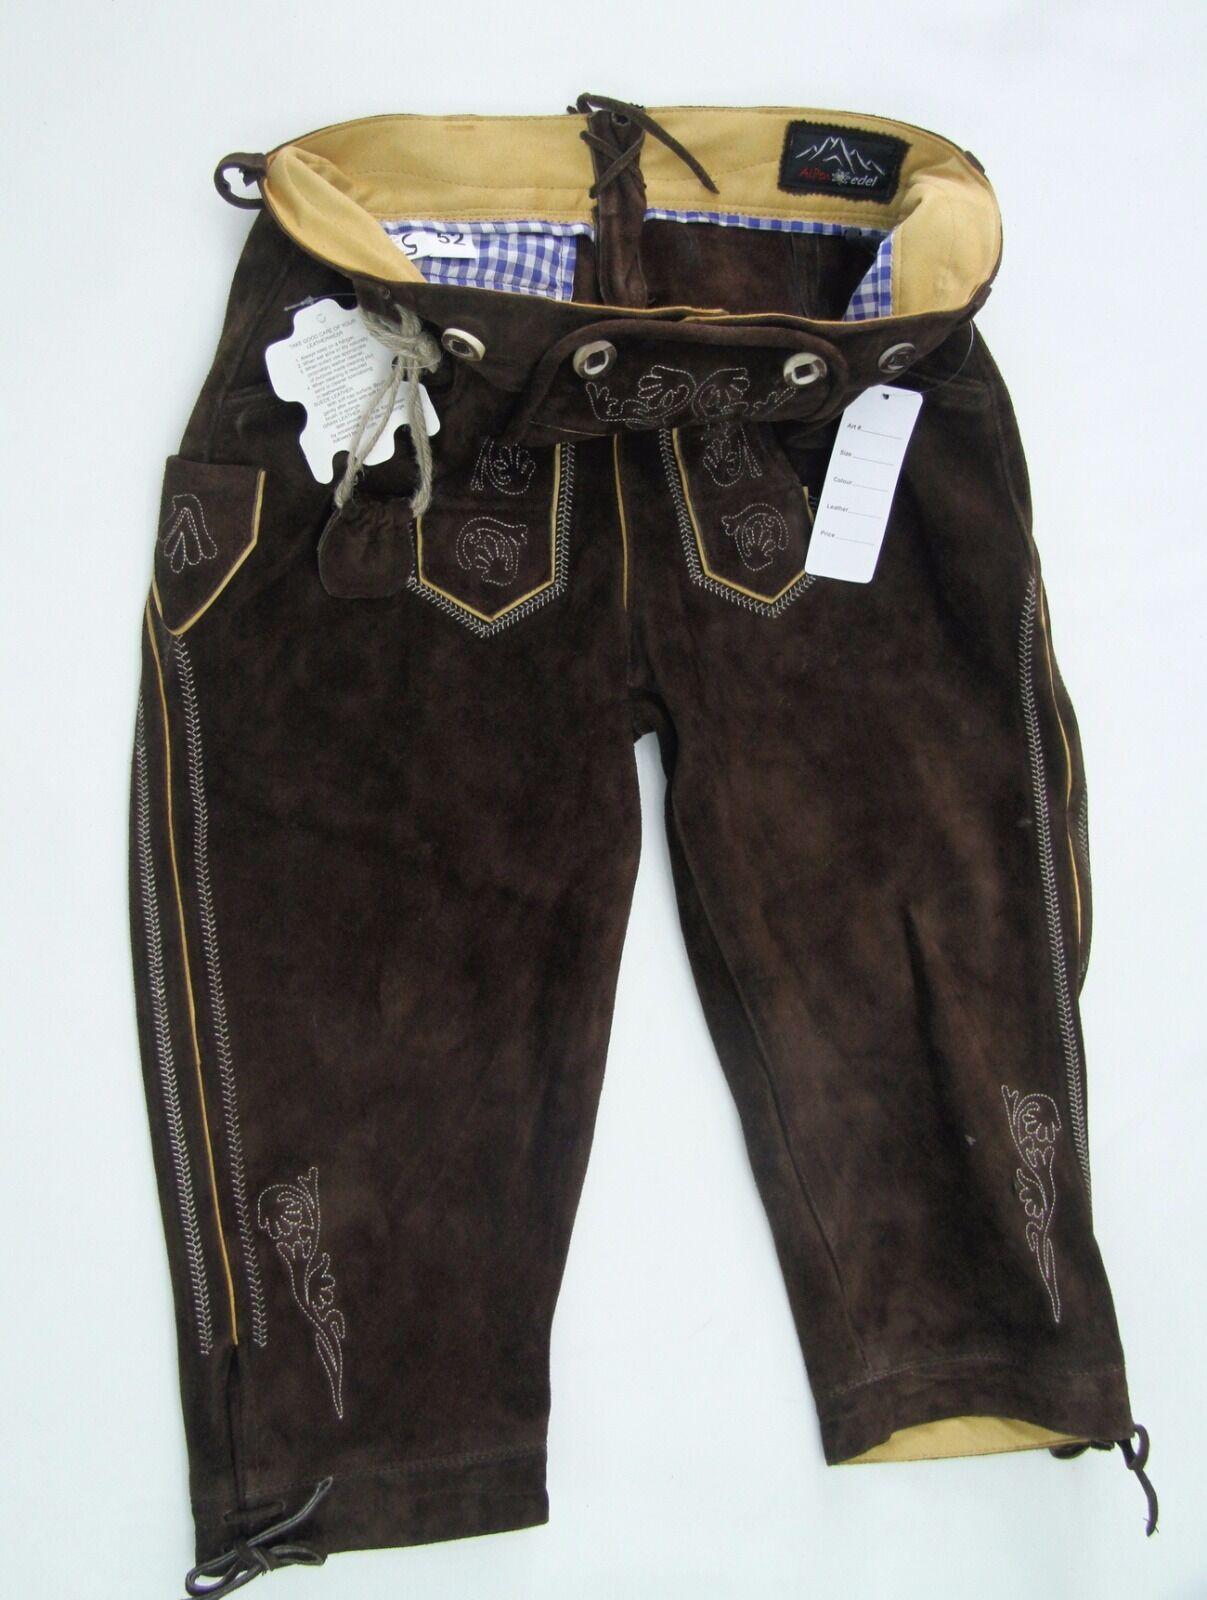 Trachtenhose Herren Dunkelbraun capri Größen 60,58,56,54,52,50,48,46 | Hohe Sicherheit  | Wirtschaft  | Mode-Muster  | Verrückter Preis  | Trendy